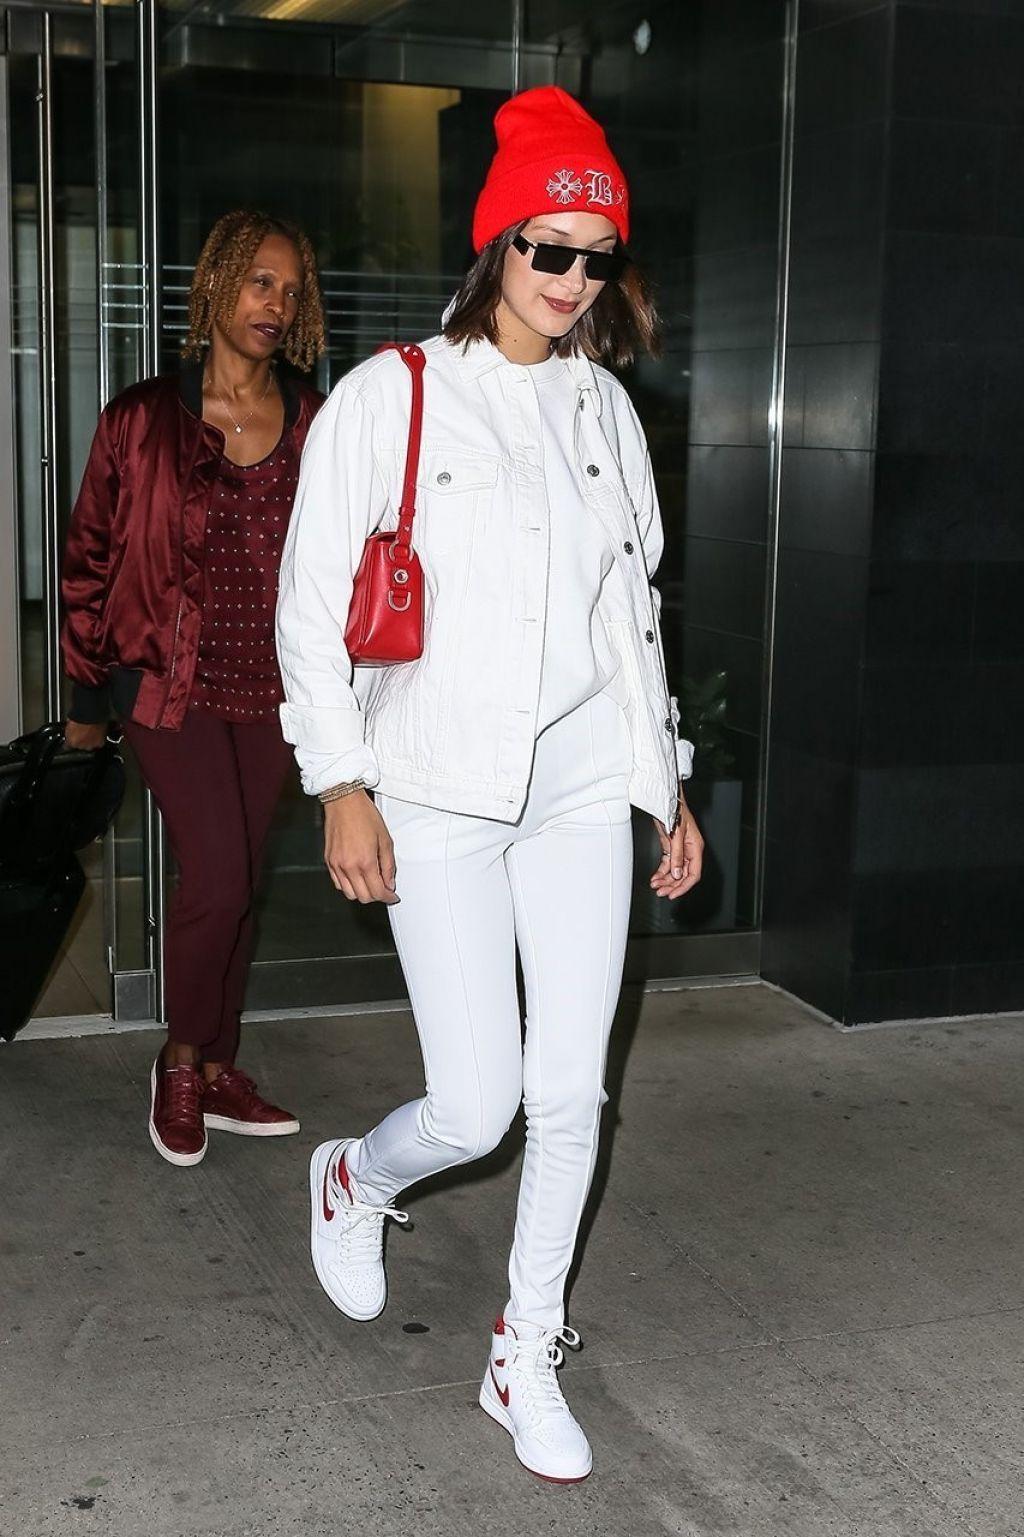 Bella Hadid U2013 Leaving Her Apartment In Manhattan, NYC 06/08/2017